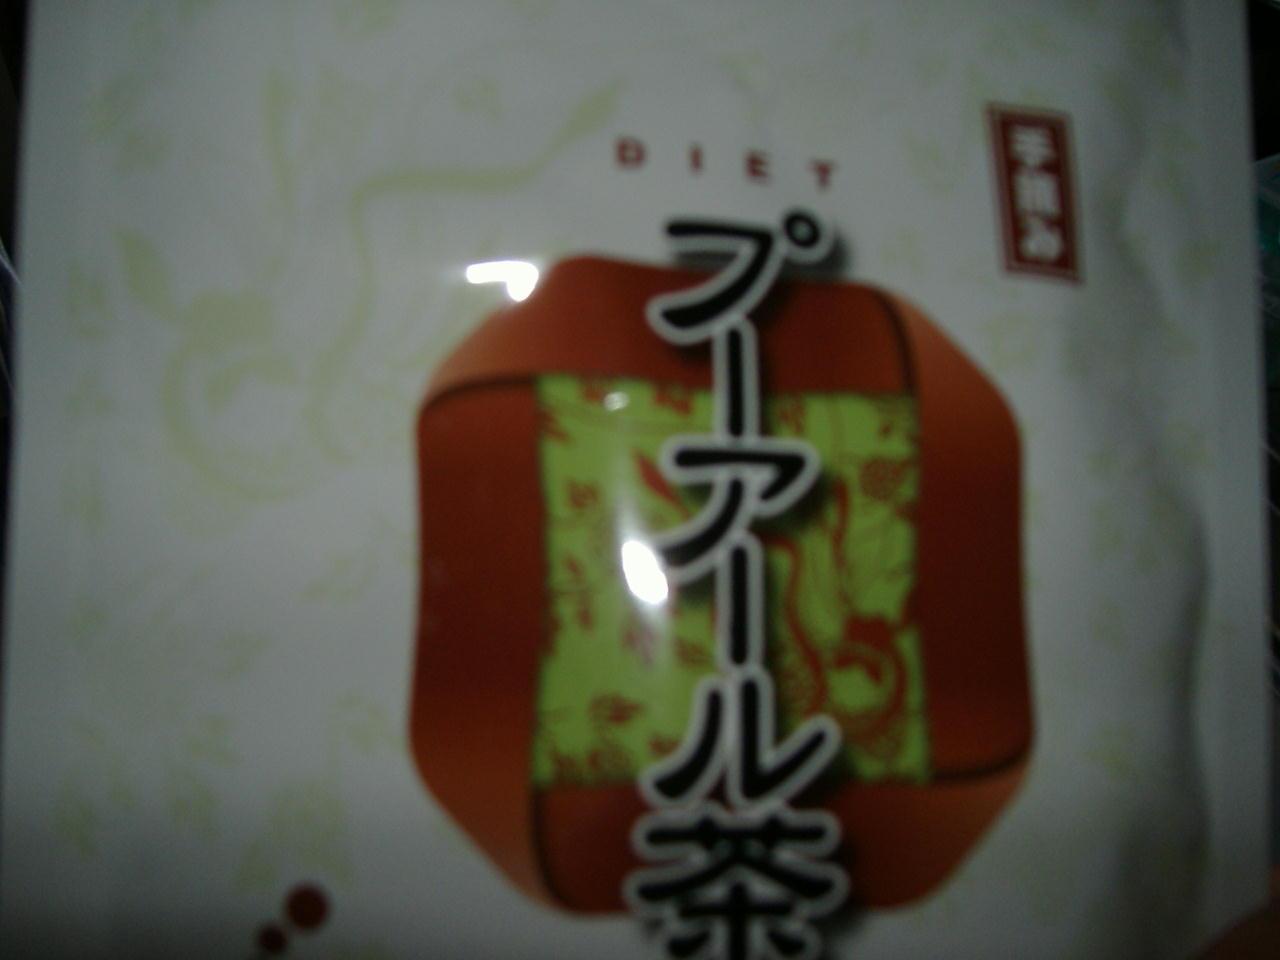 PHOTO438.JPG